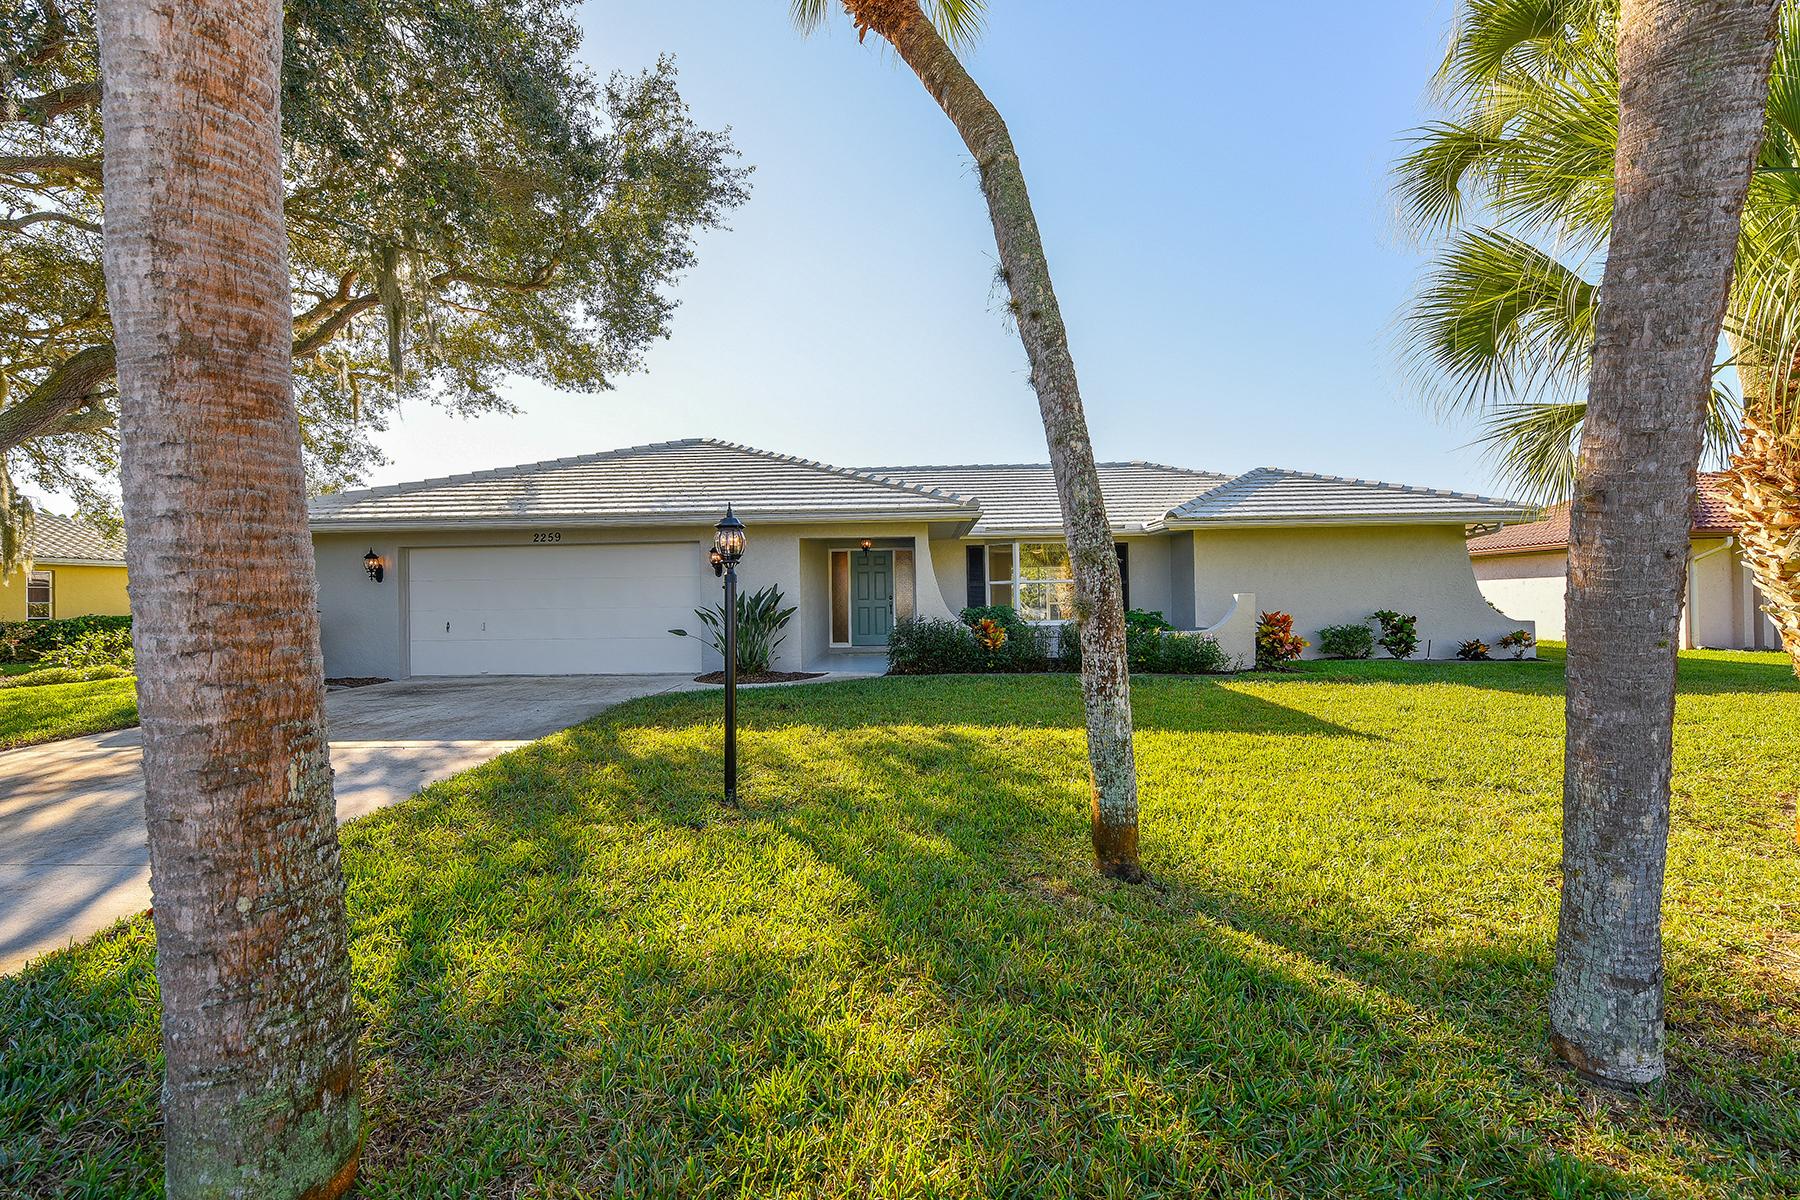 Single Family Home for Sale at SORRENTO EAST 2259 Lakewood Dr Nokomis, Florida 34275 United States